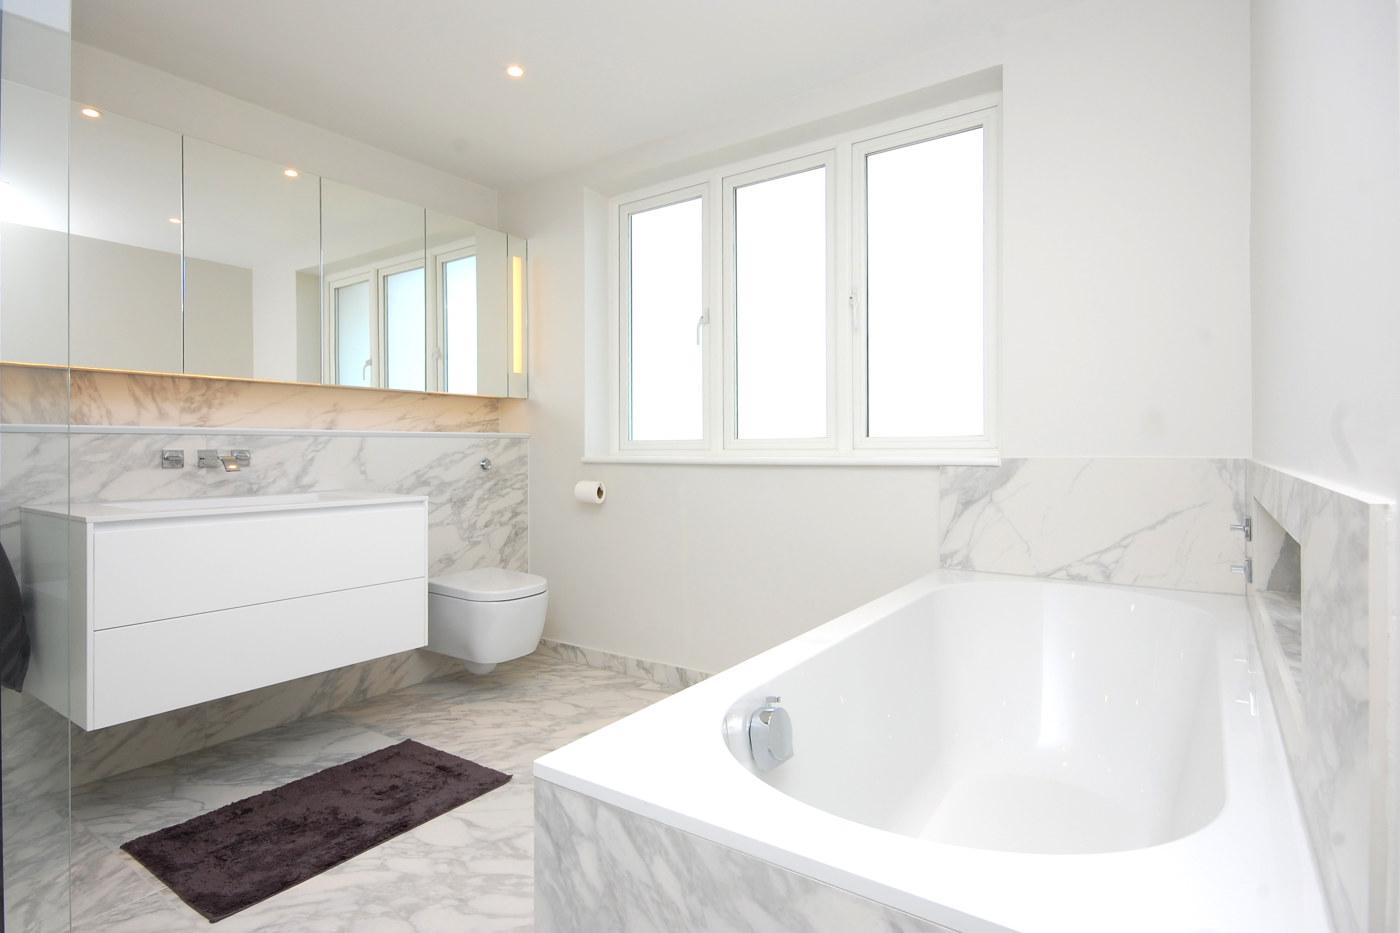 Golders Green Residential Bathroom Refurbishment London Bath